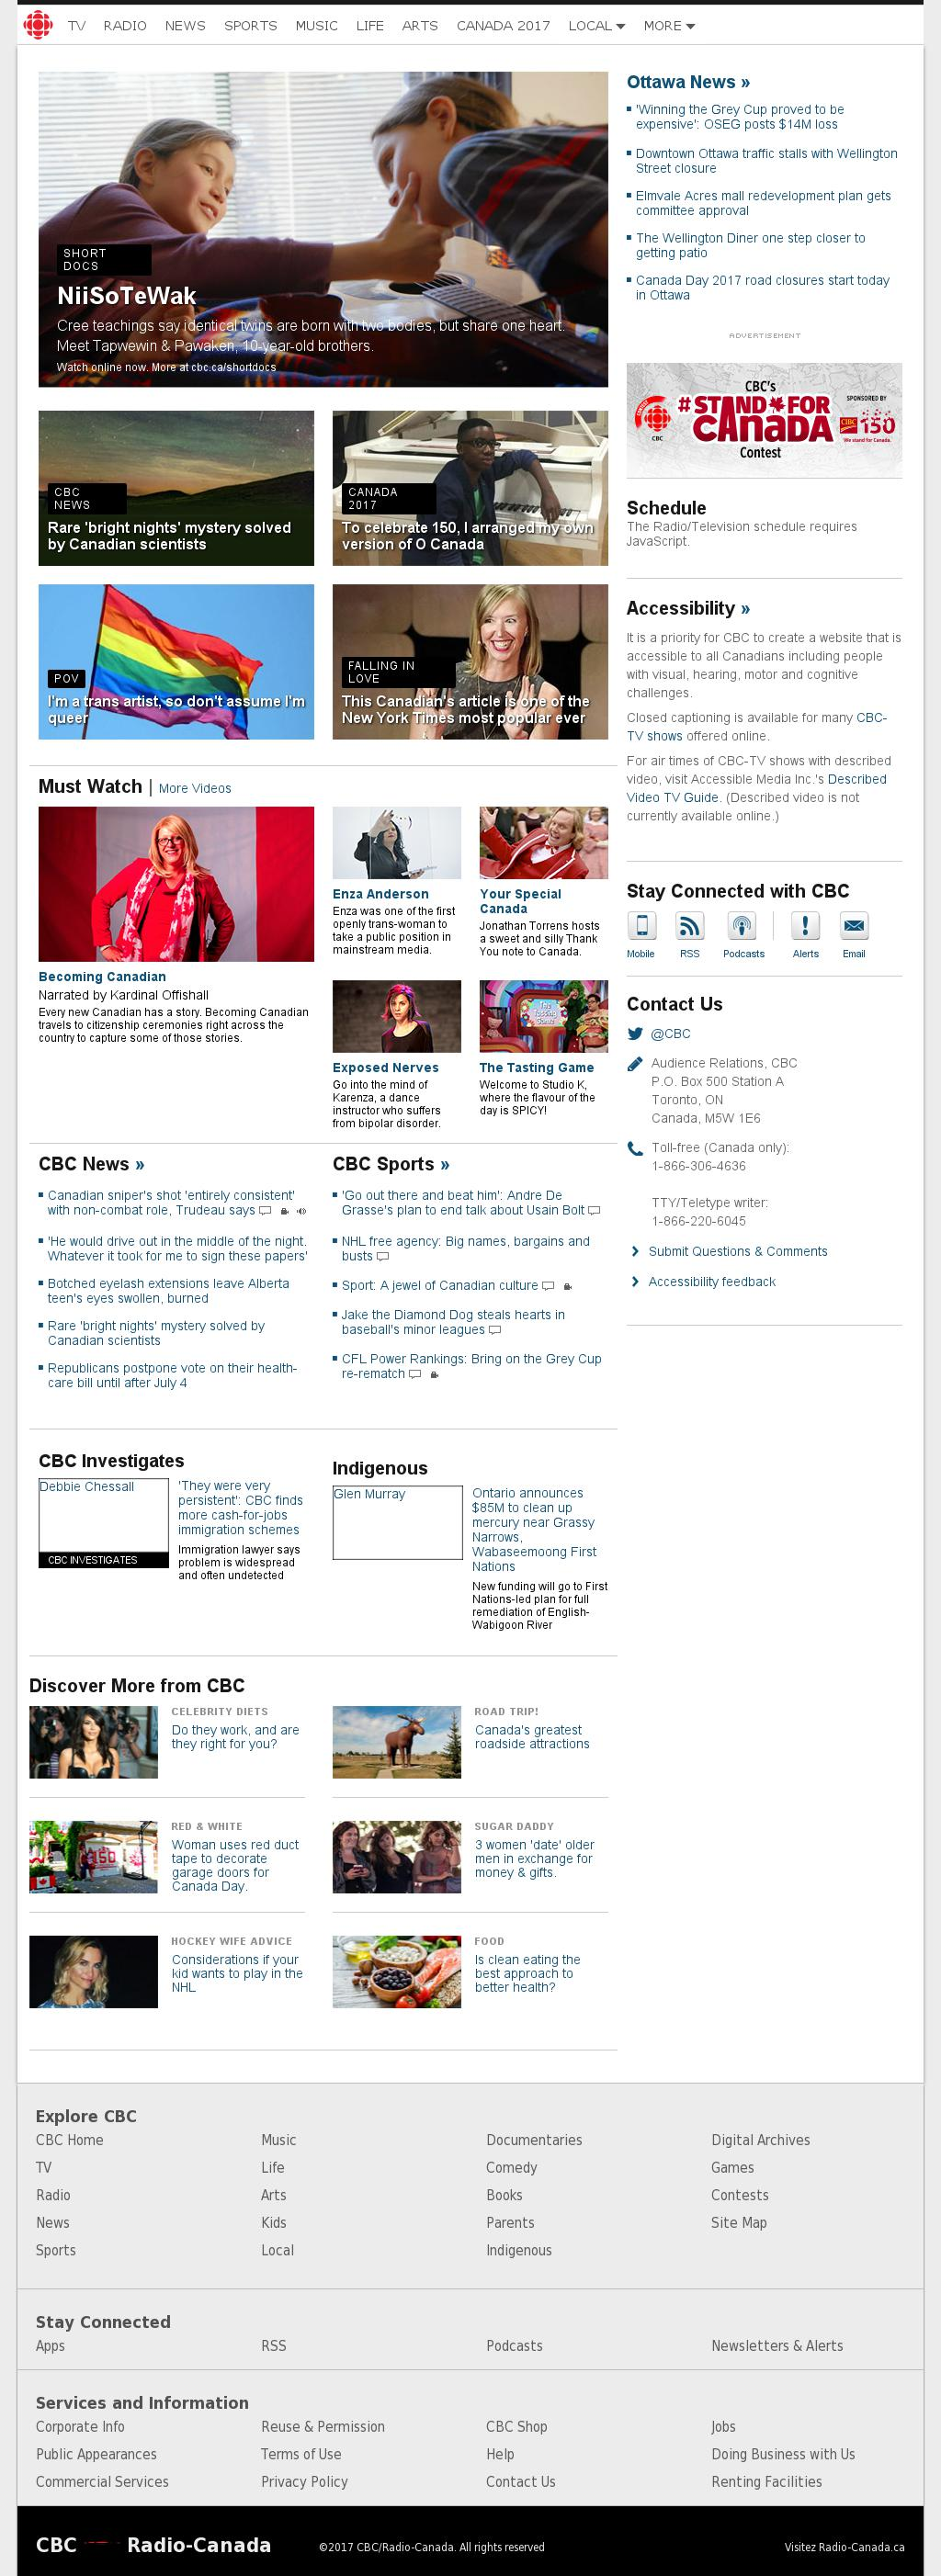 CBC at Wednesday June 28, 2017, 12:02 a.m. UTC